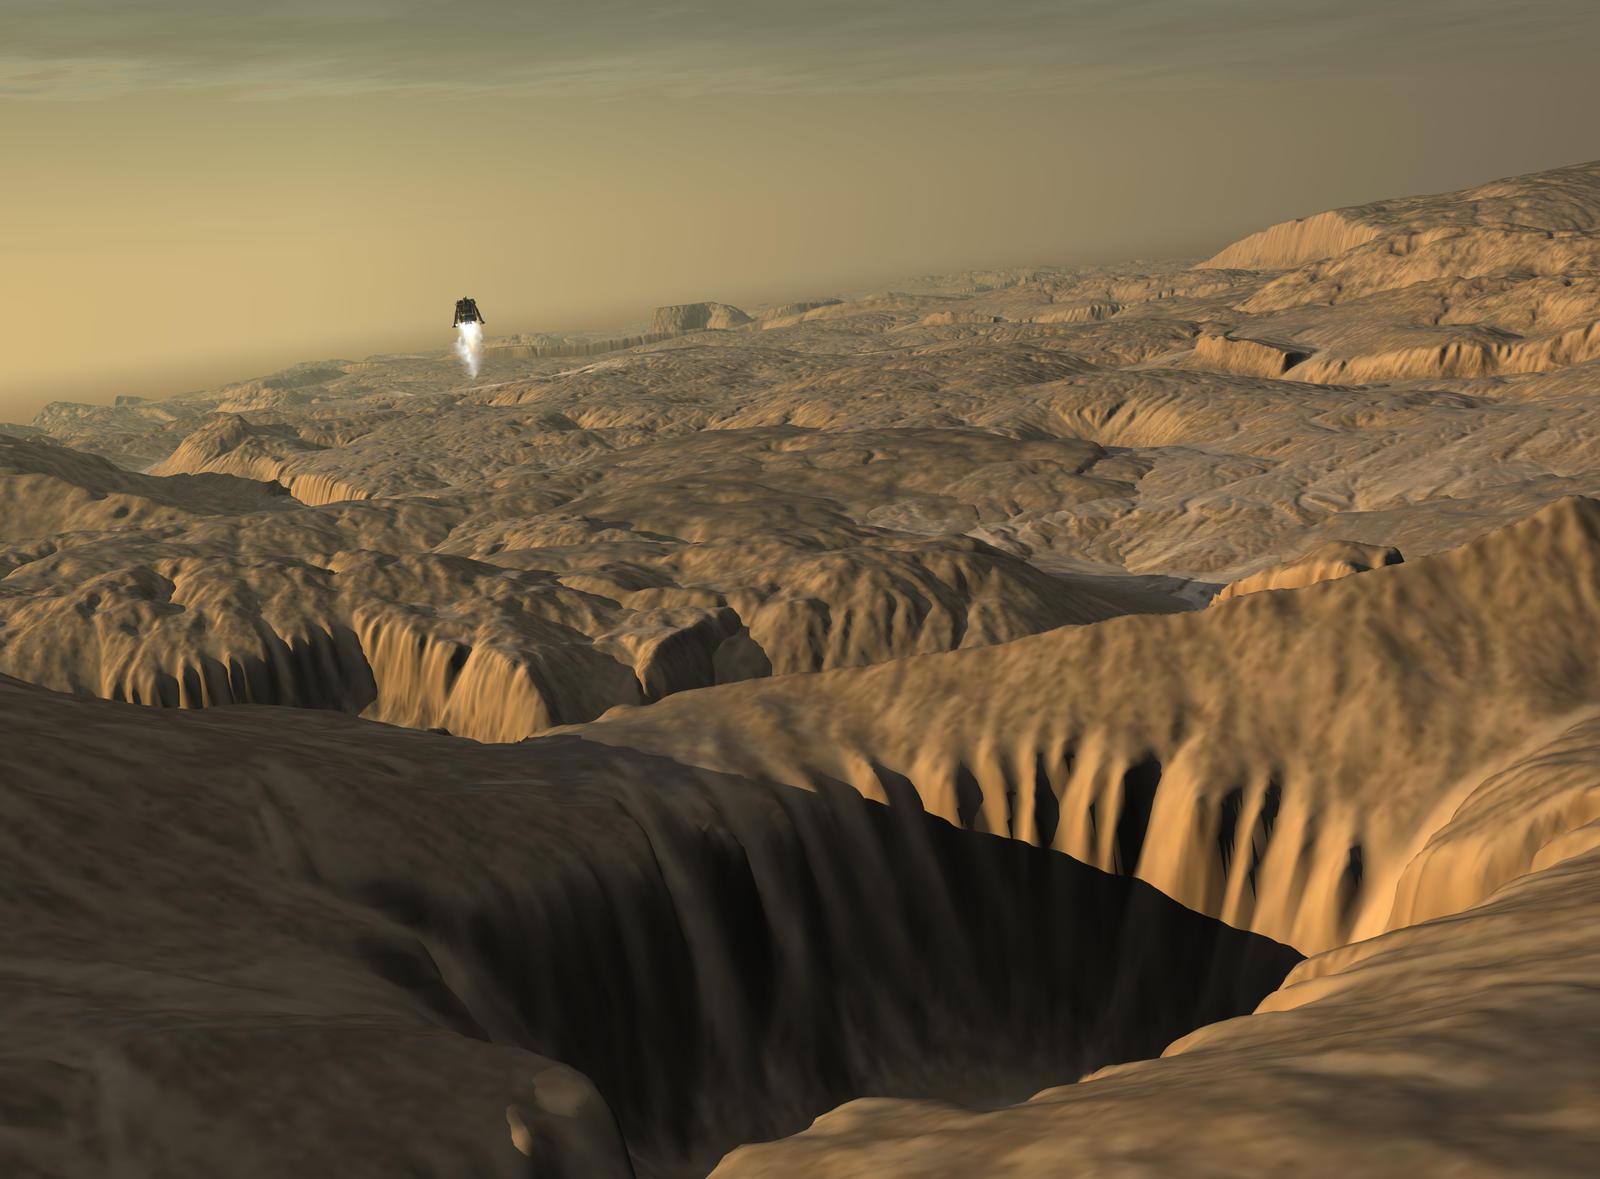 Celestia screenshots gallery/Mars - Noctis Labyrinthus